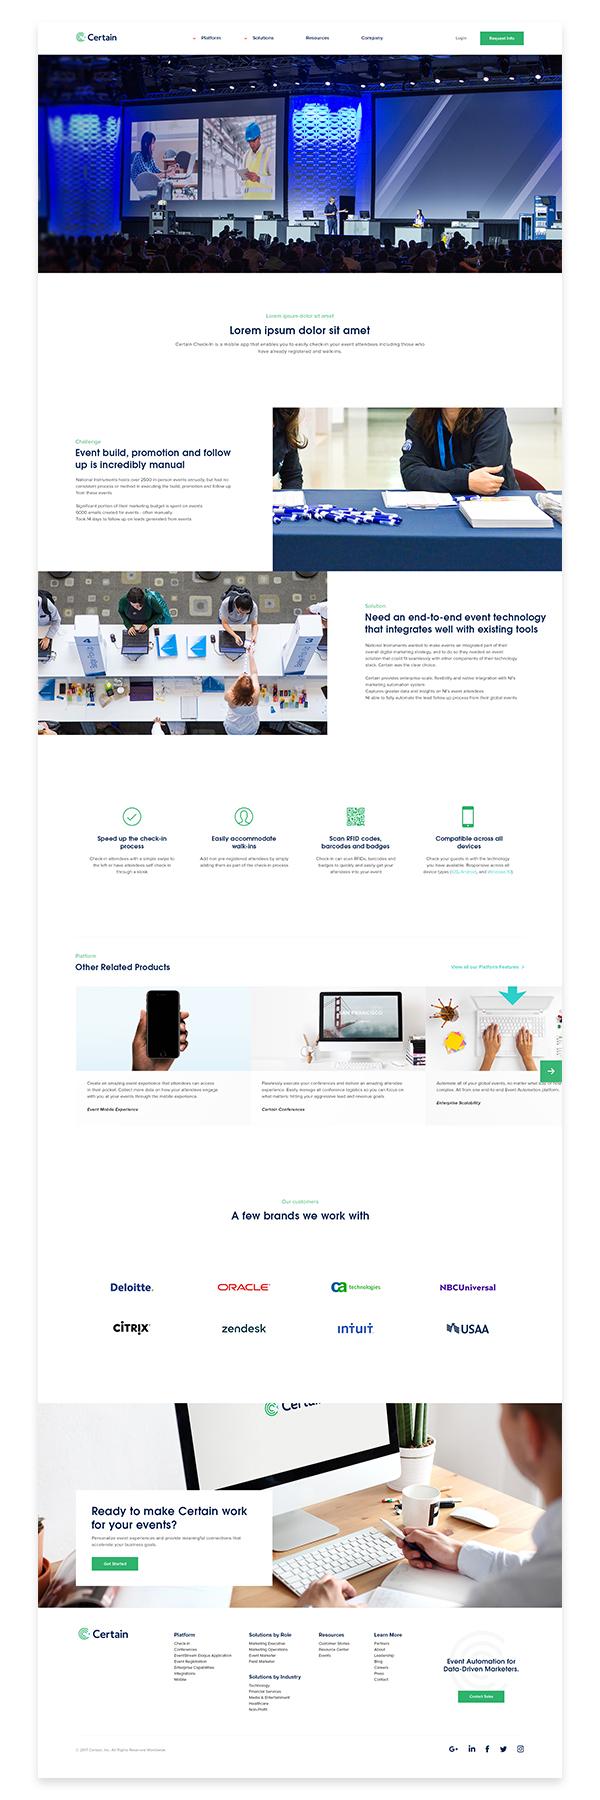 certain-marketing-website-2.jpg